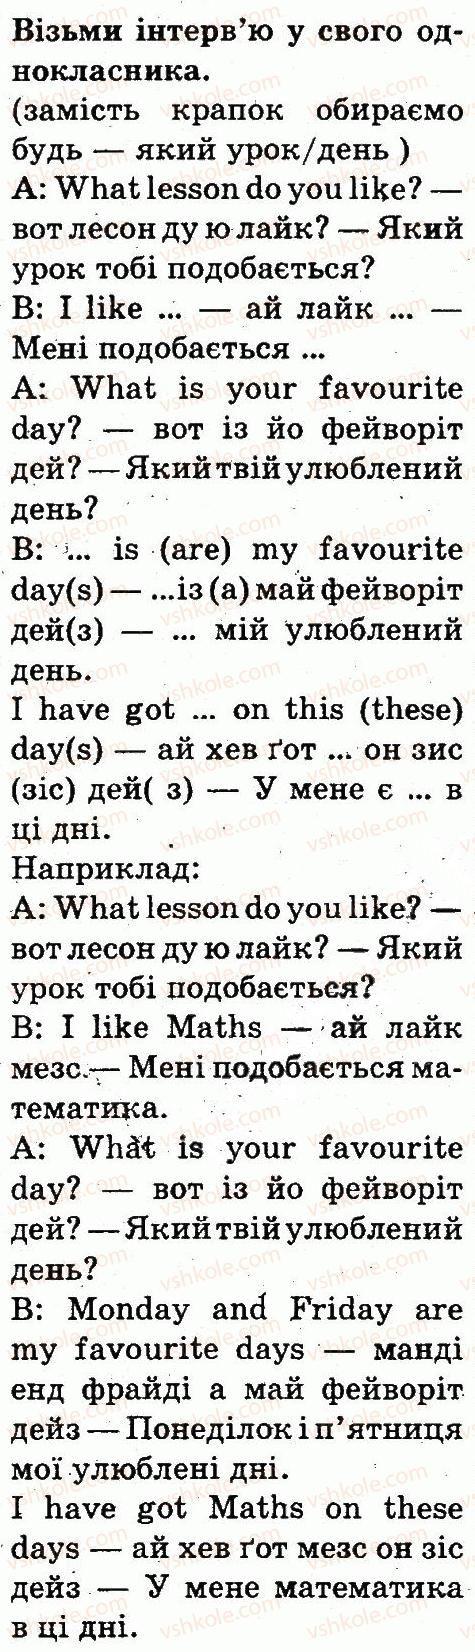 3-anglijska-mova-od-karpyuk-2013--unit-3-welcome-back-to-school-lesson-3-3-rnd1415.jpg